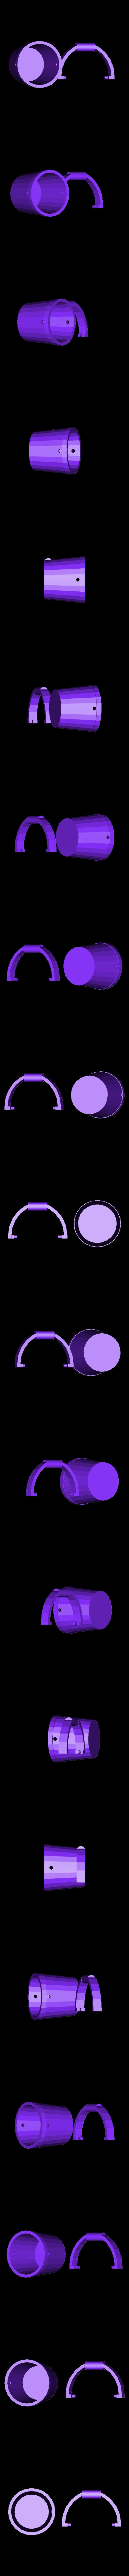 playmobil_eimer_fixed__5_.stl Download free STL file Playmobil bucket - Eimer, Kübel • 3D print object, Beekeeper3Dprinter